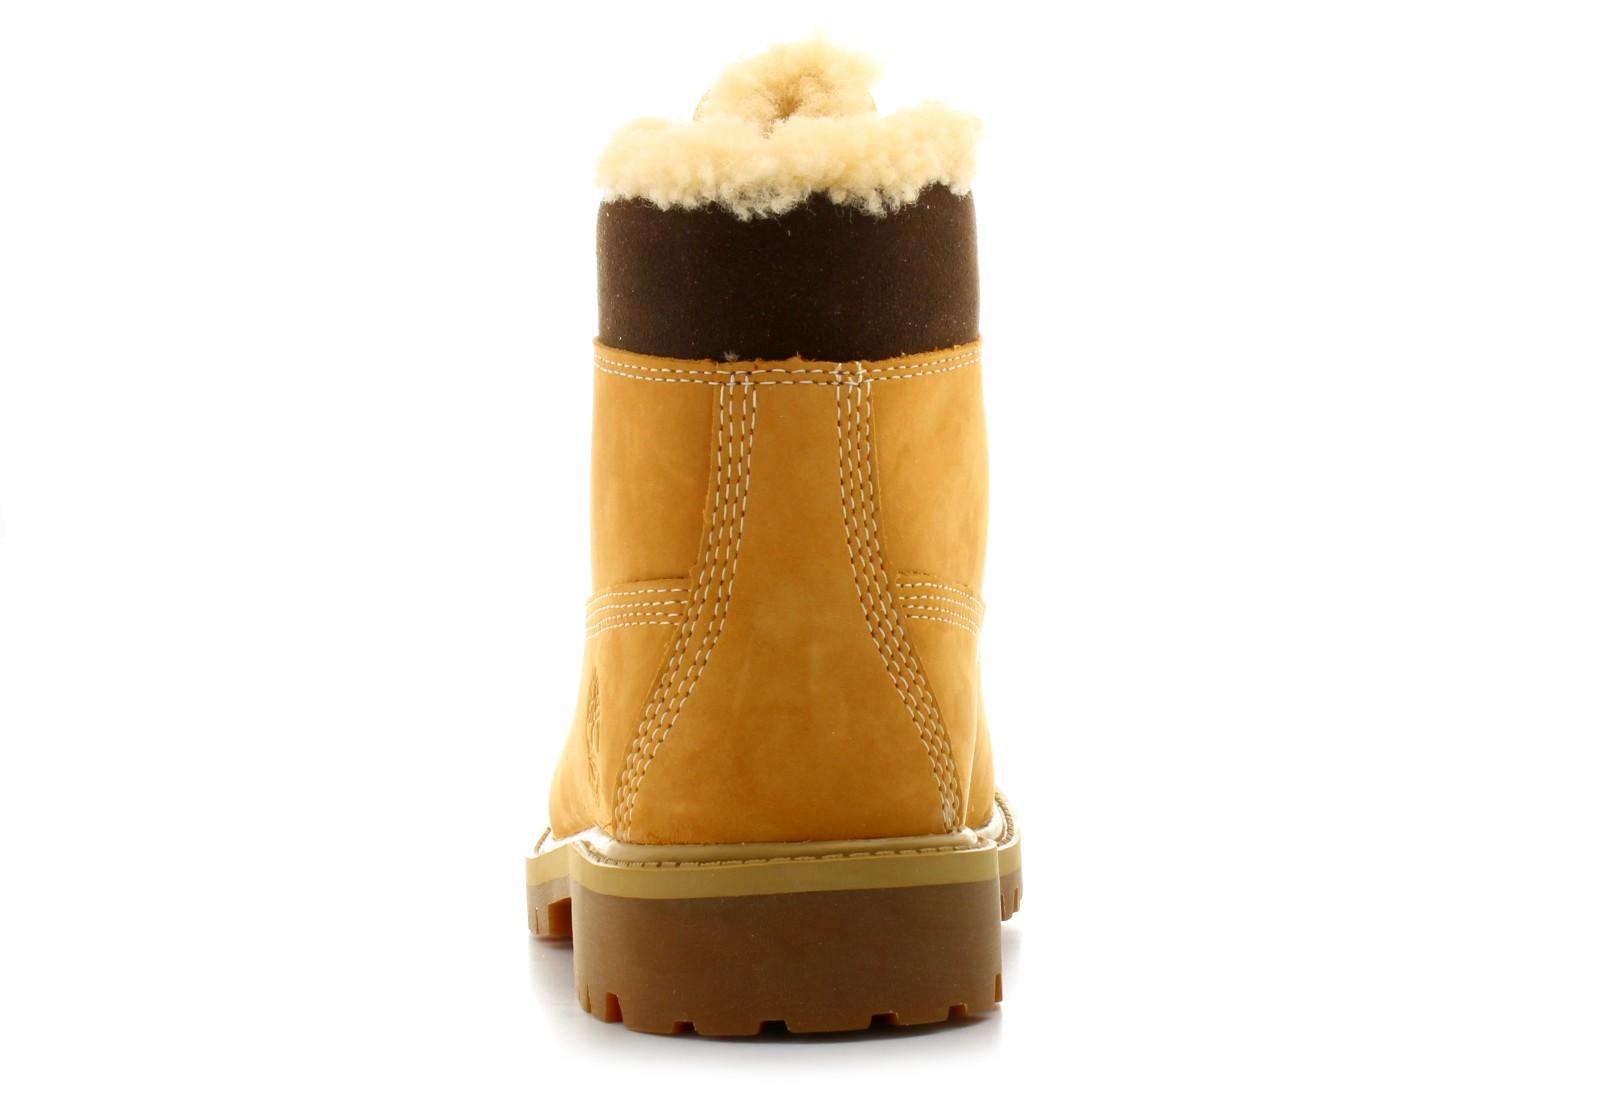 d3a3d57057c9 Timberland Boty 6 Inch Shrl Boot 4